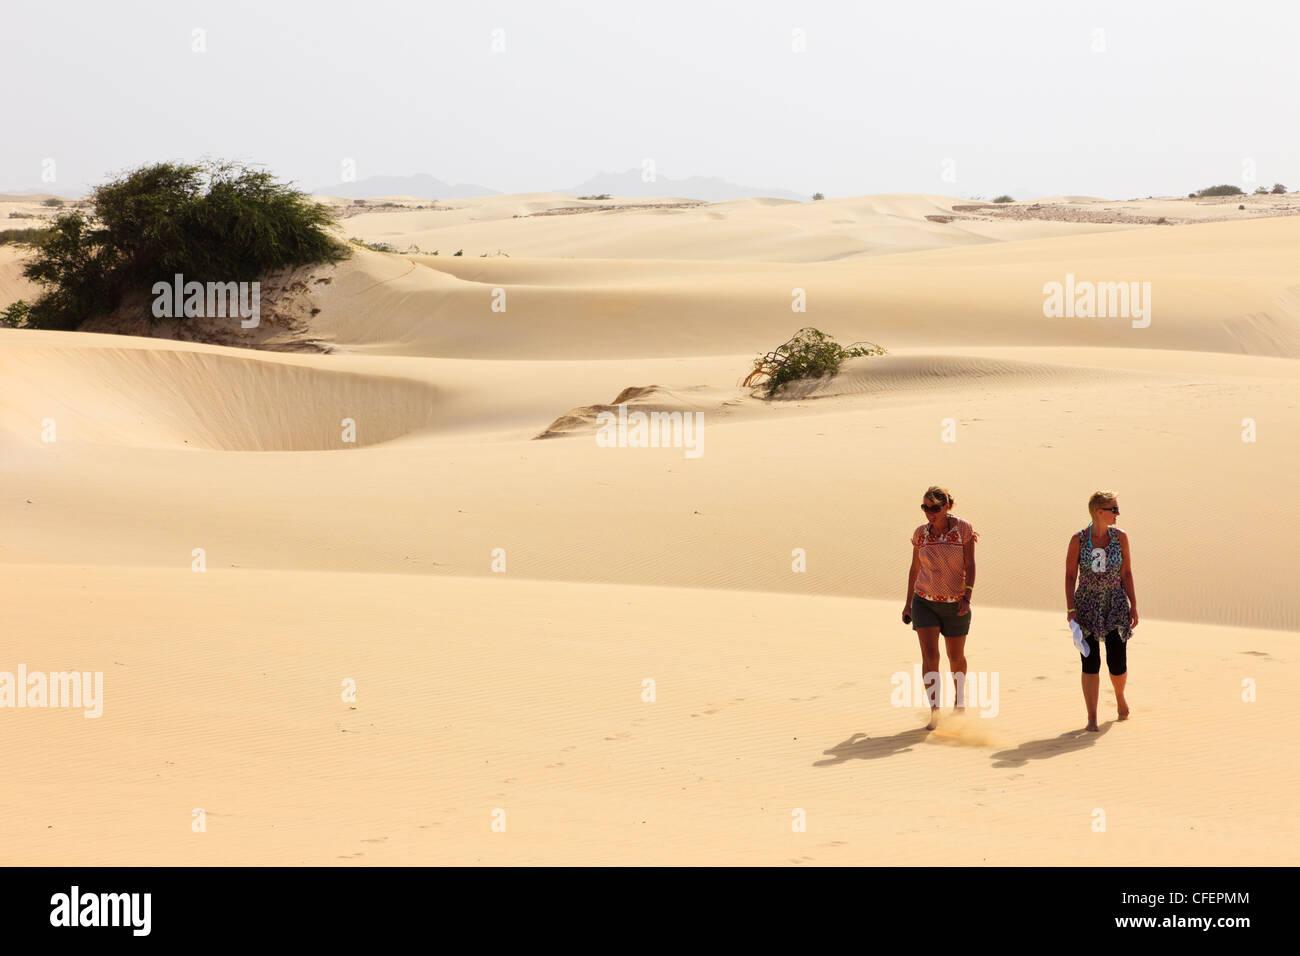 View of two women tourists walking barefoot on hot empty desert sand dunes. Deserto de Viana, Boa Vista, Cape Verde Stock Photo